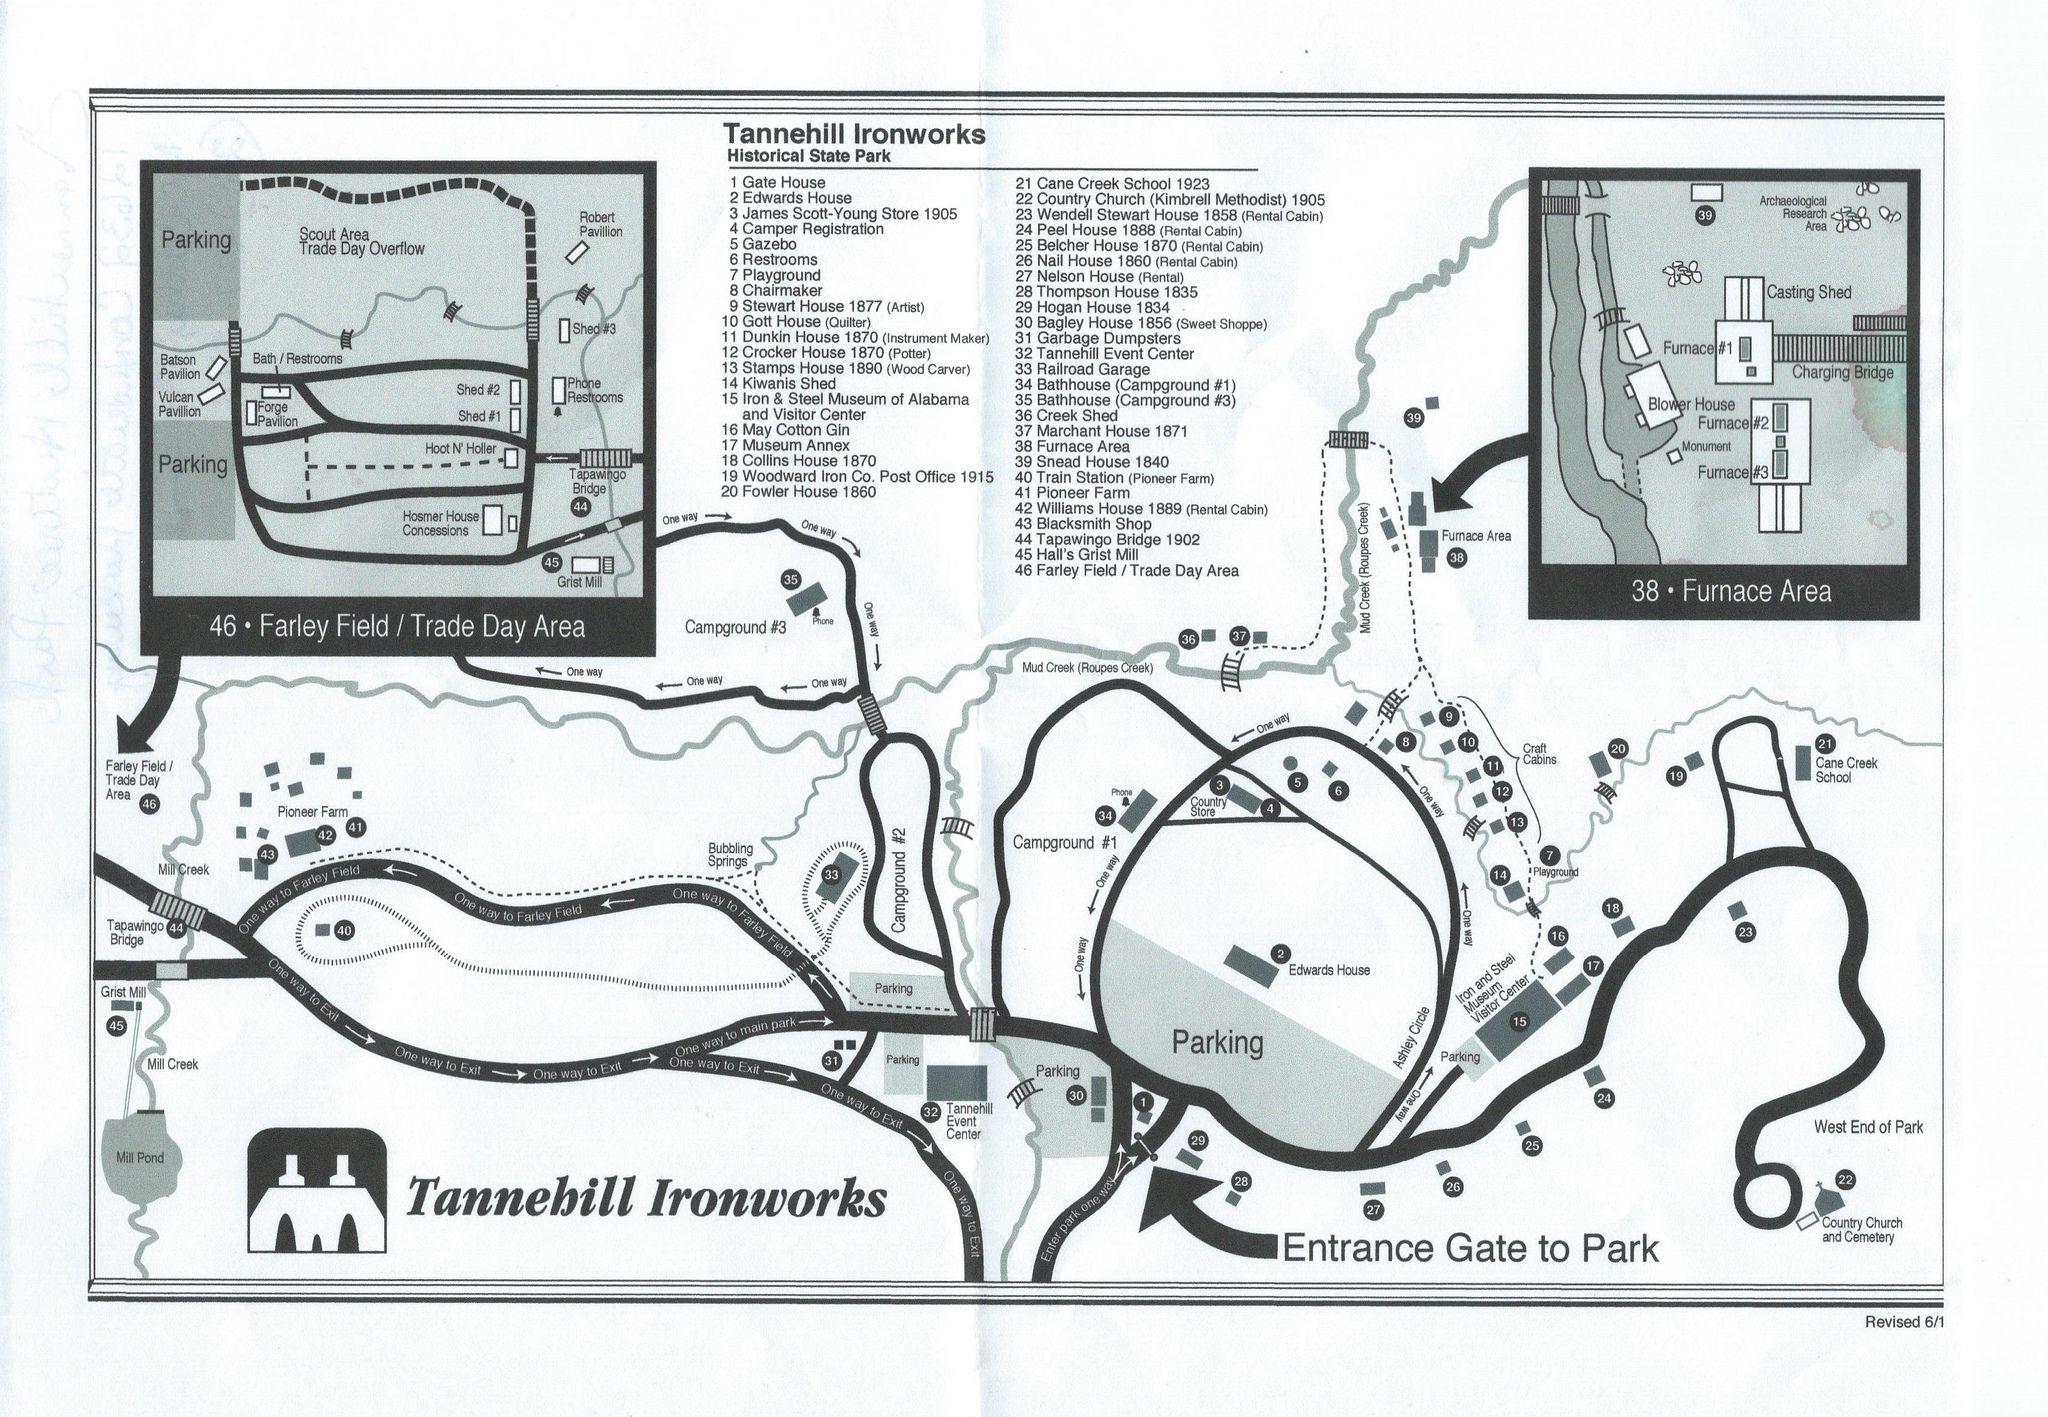 Tannehill Ironworks Historical State Park Map